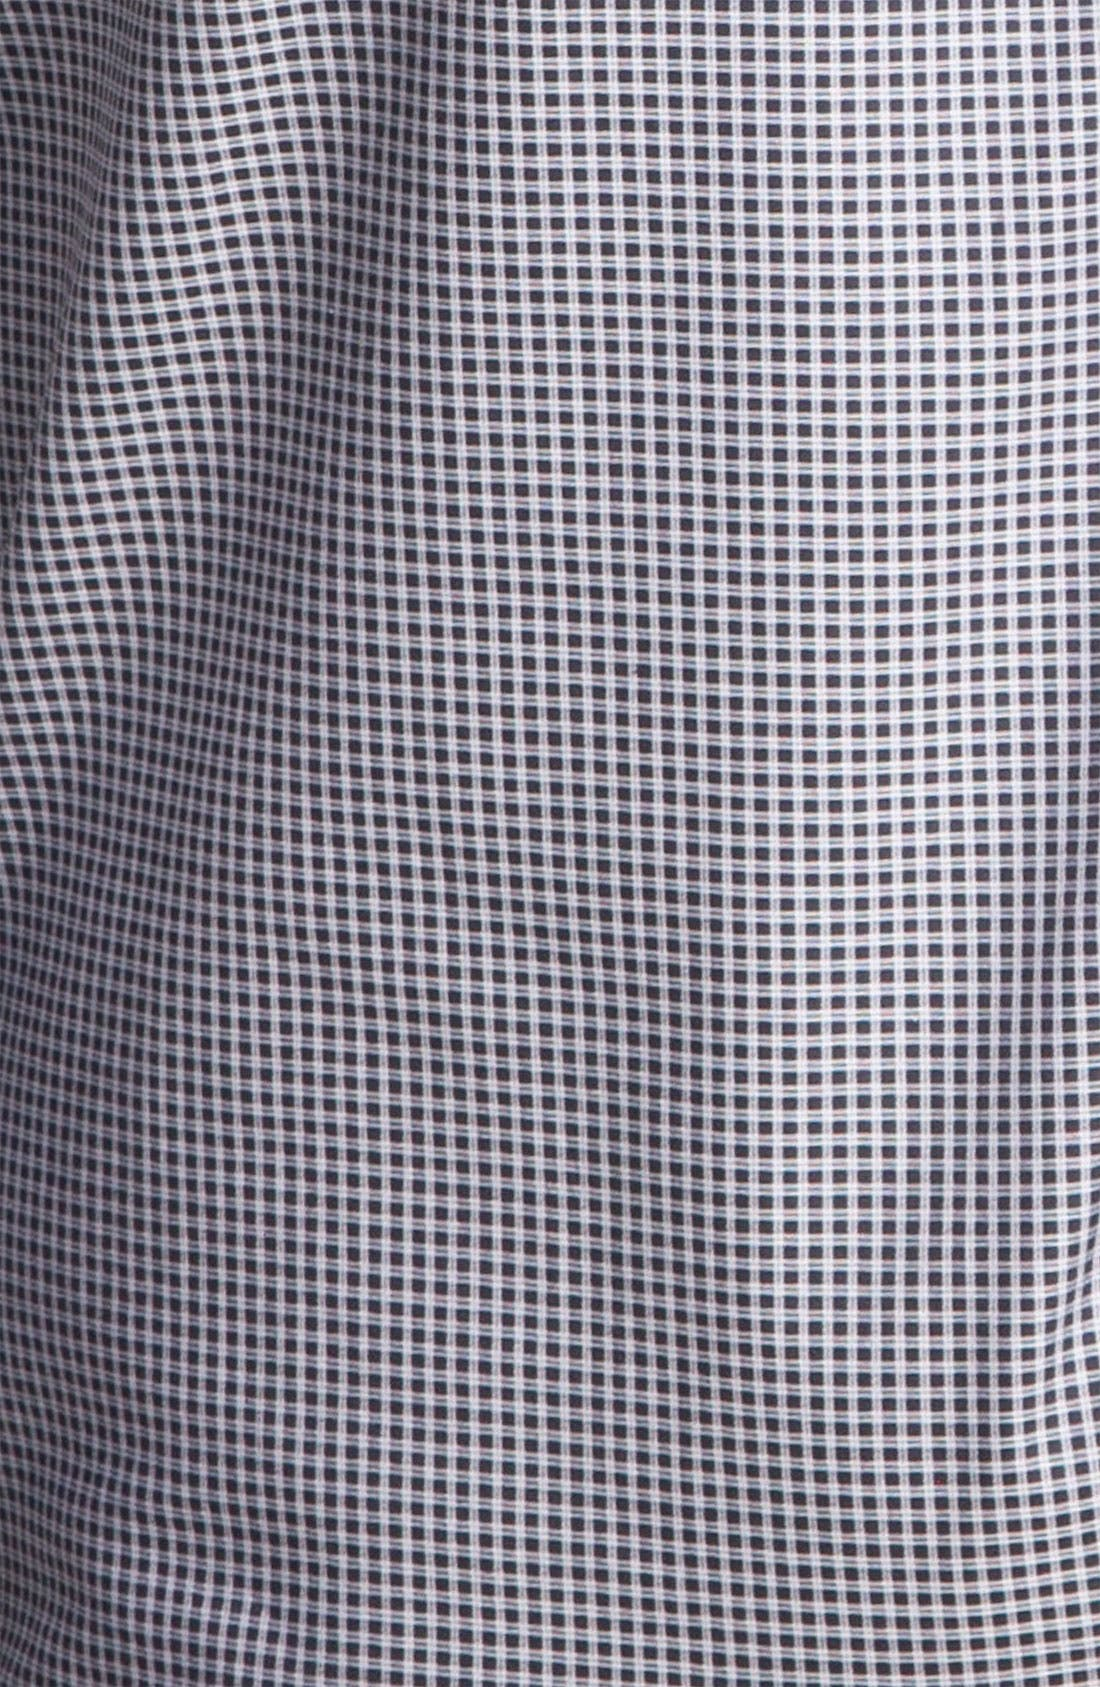 Alternate Image 3  - Armani Collezioni Gingham Print Shirt